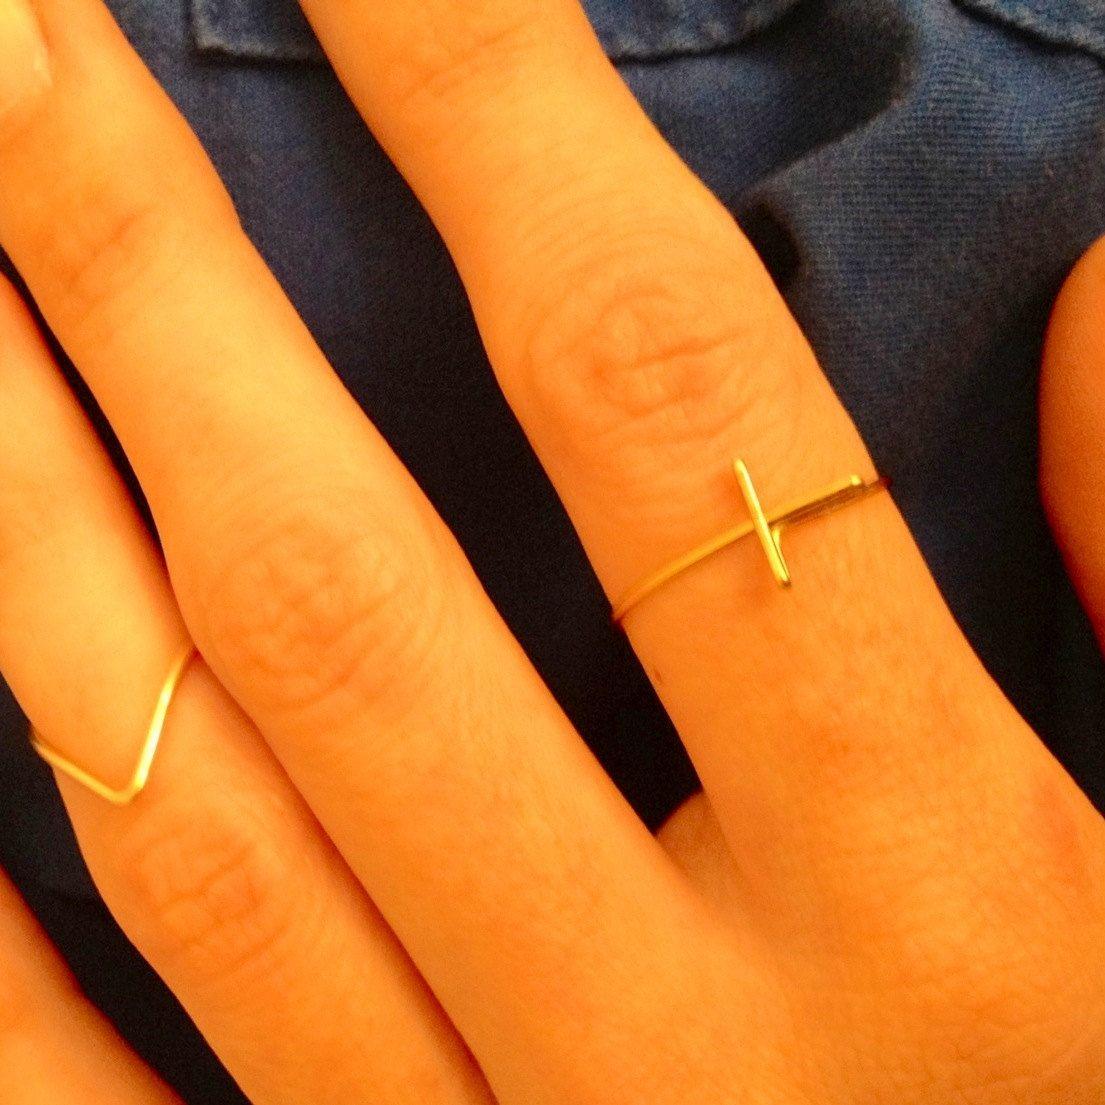 Sideways Cross Ring Knuckle or Regular Adjustable by MadebyLeahSue